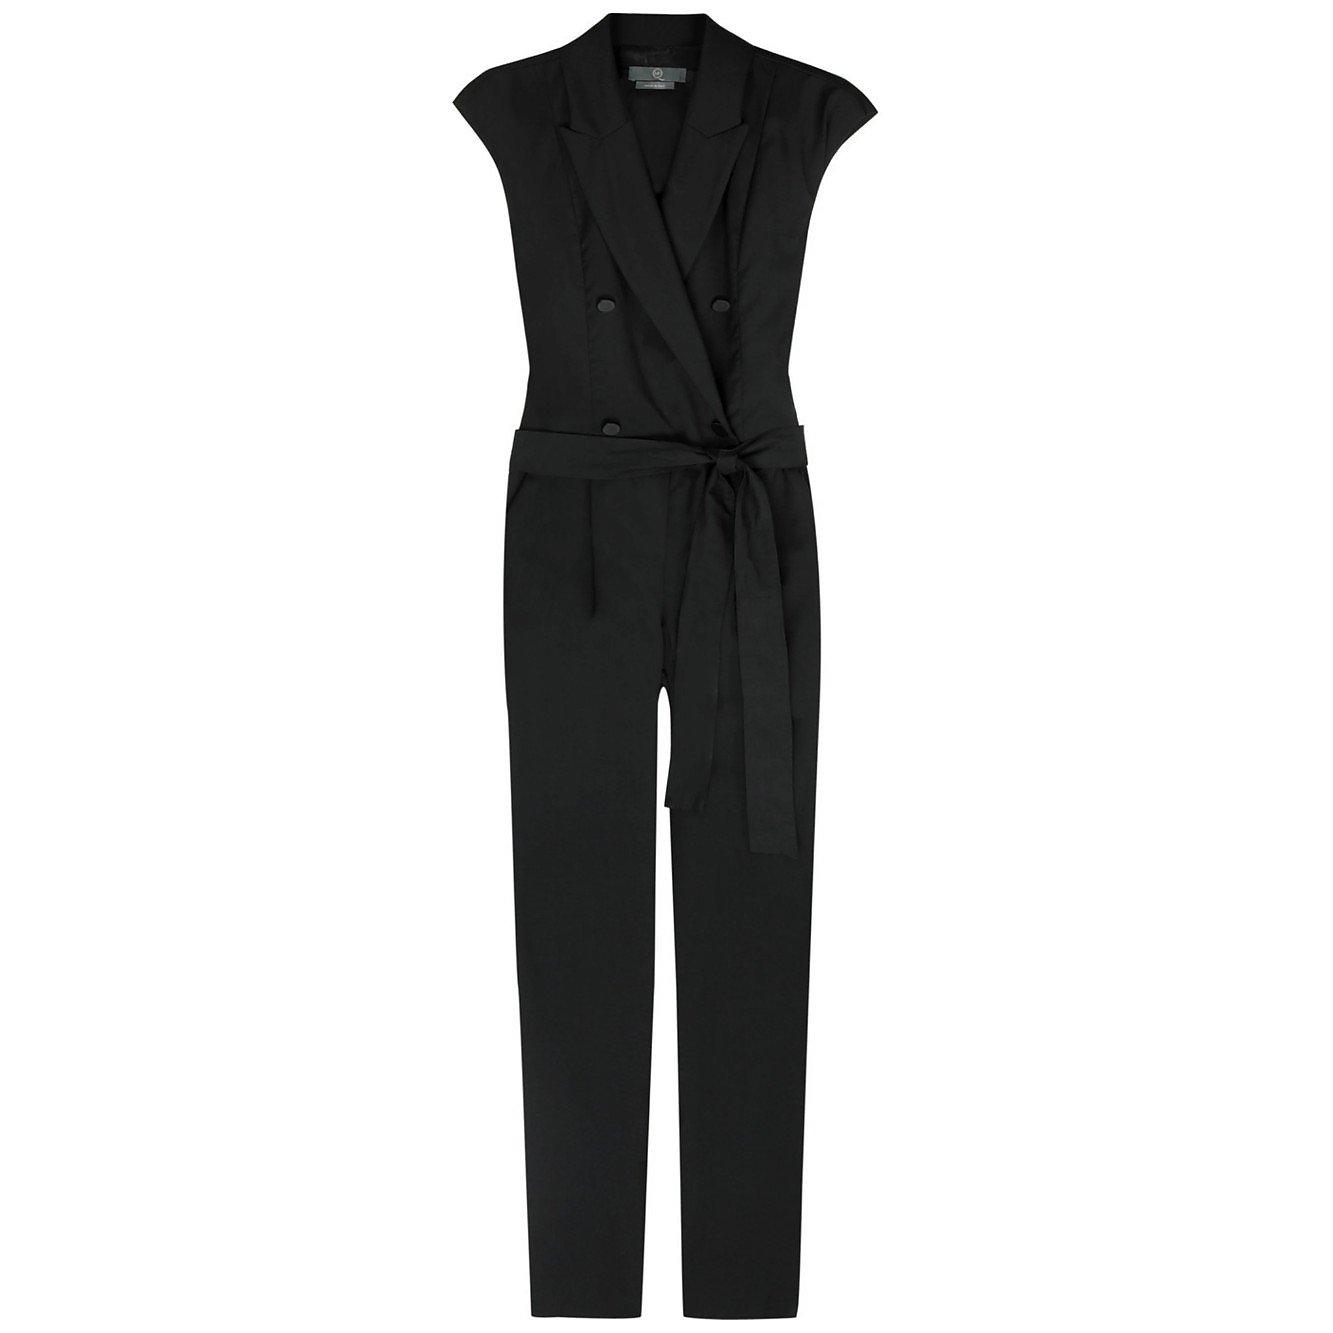 McQ Wool Tuxedo Jumpsuit